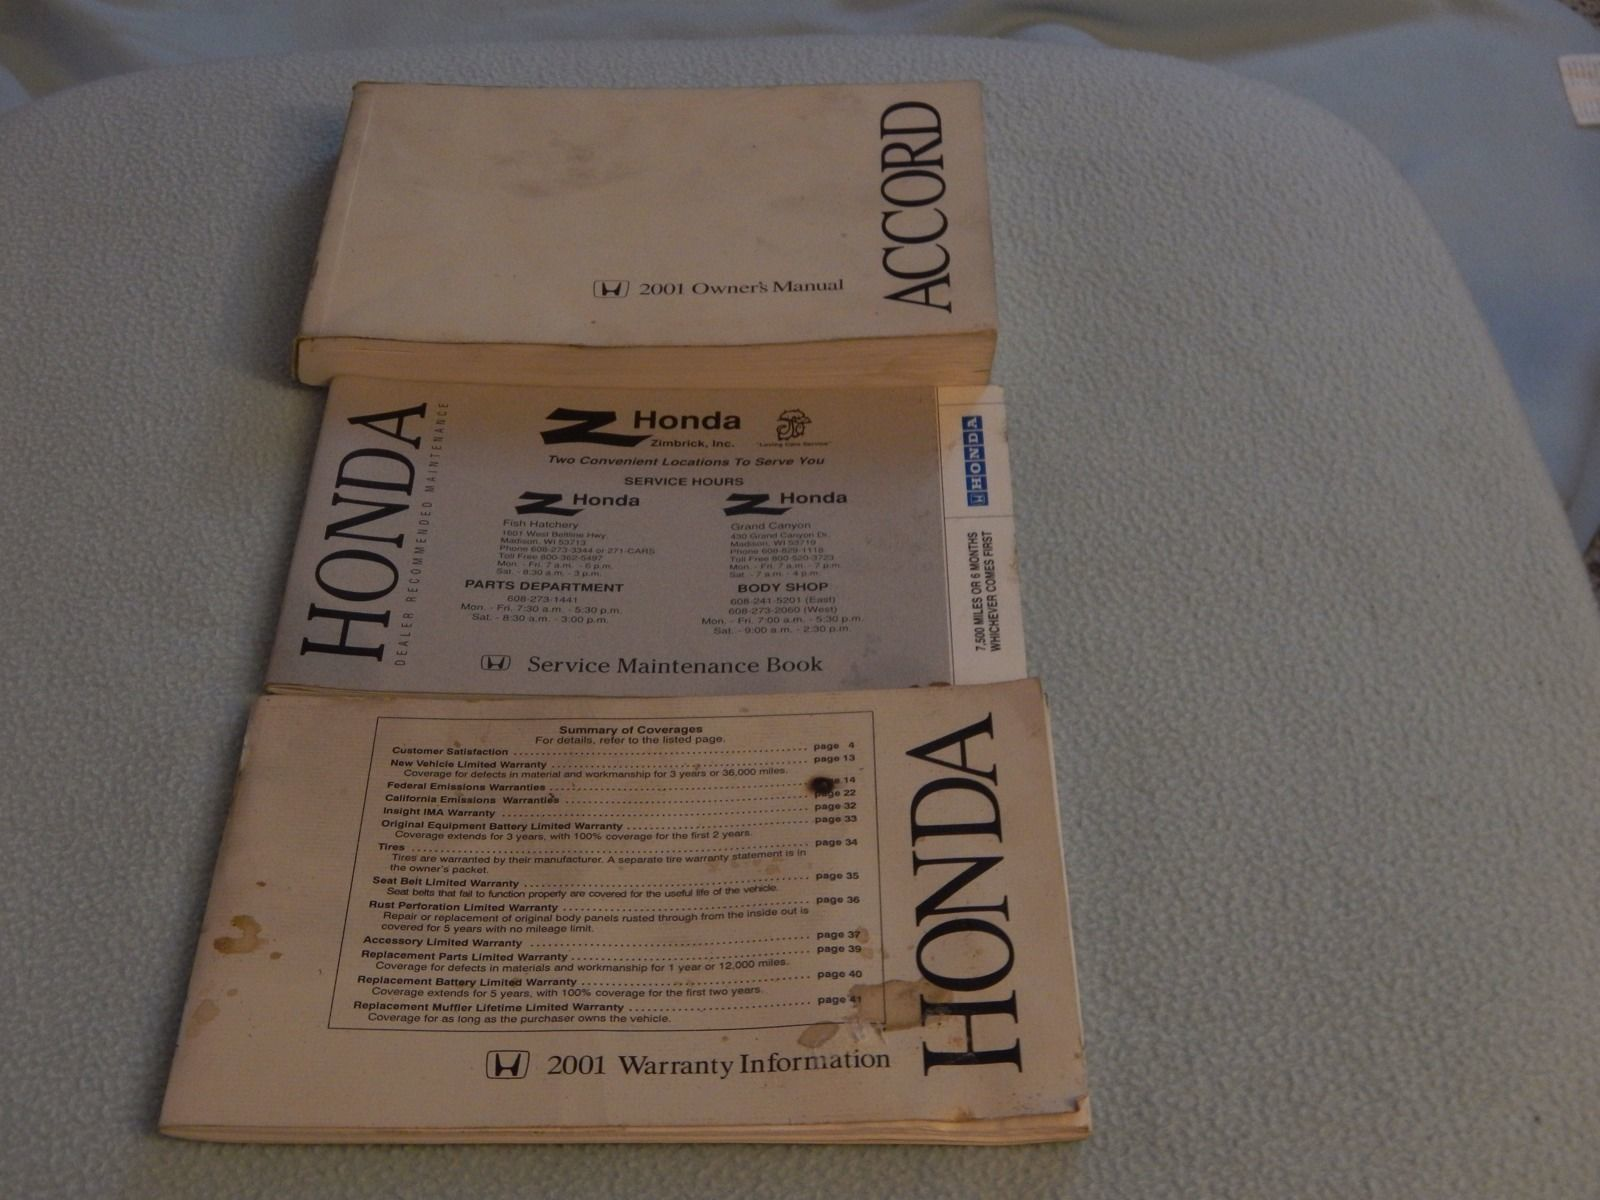 2001 honda accord owners manual and 18 similar items rh bonanza com honda accord 2001 owners manual pdf 2001 honda accord owners manual online